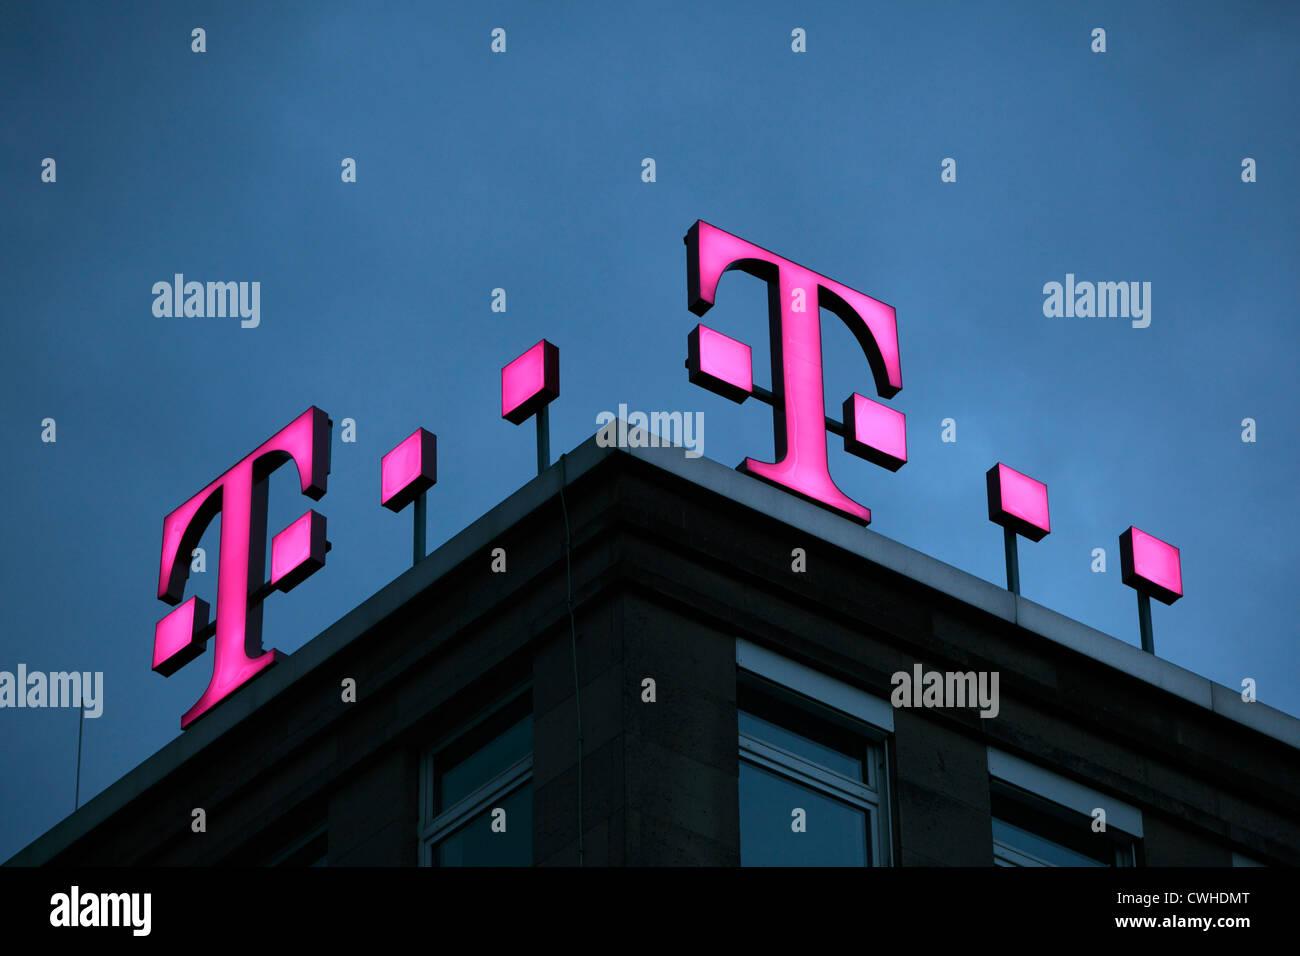 D-Dortmund, Ruhr area, Westphalia, North Rhine-Westphalia, NRW, company logo, illuminated, Deutsche Telekom AG, - Stock Image